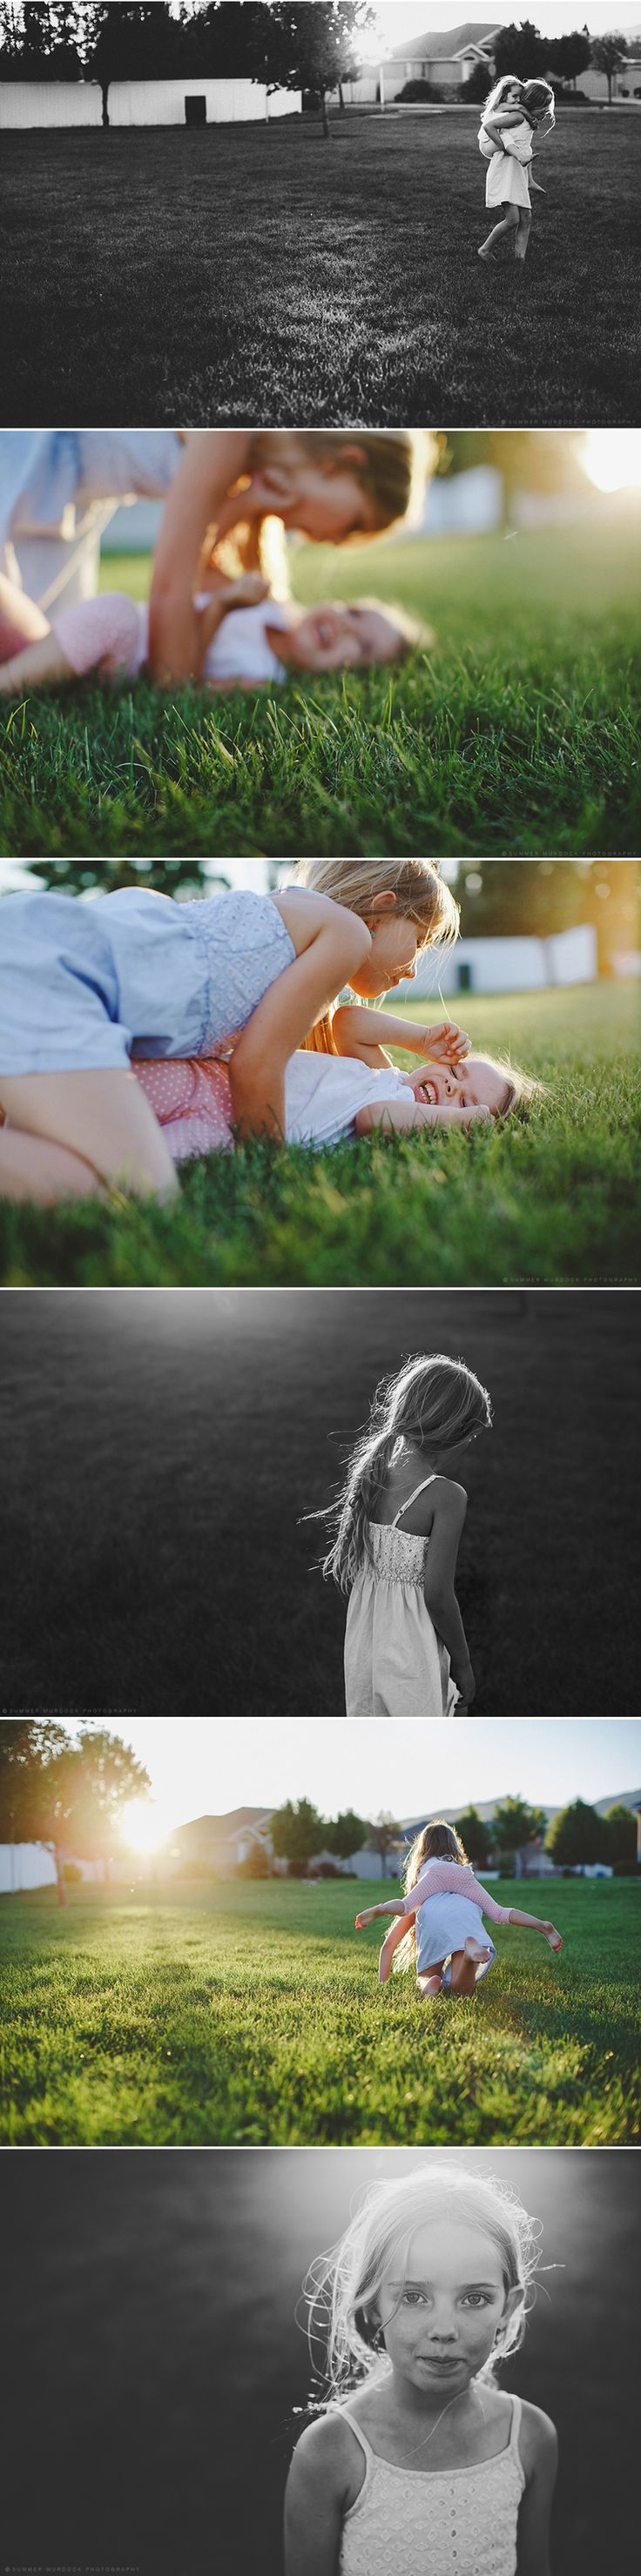 Summer Murdock Photography Salt Lake City Photographer...